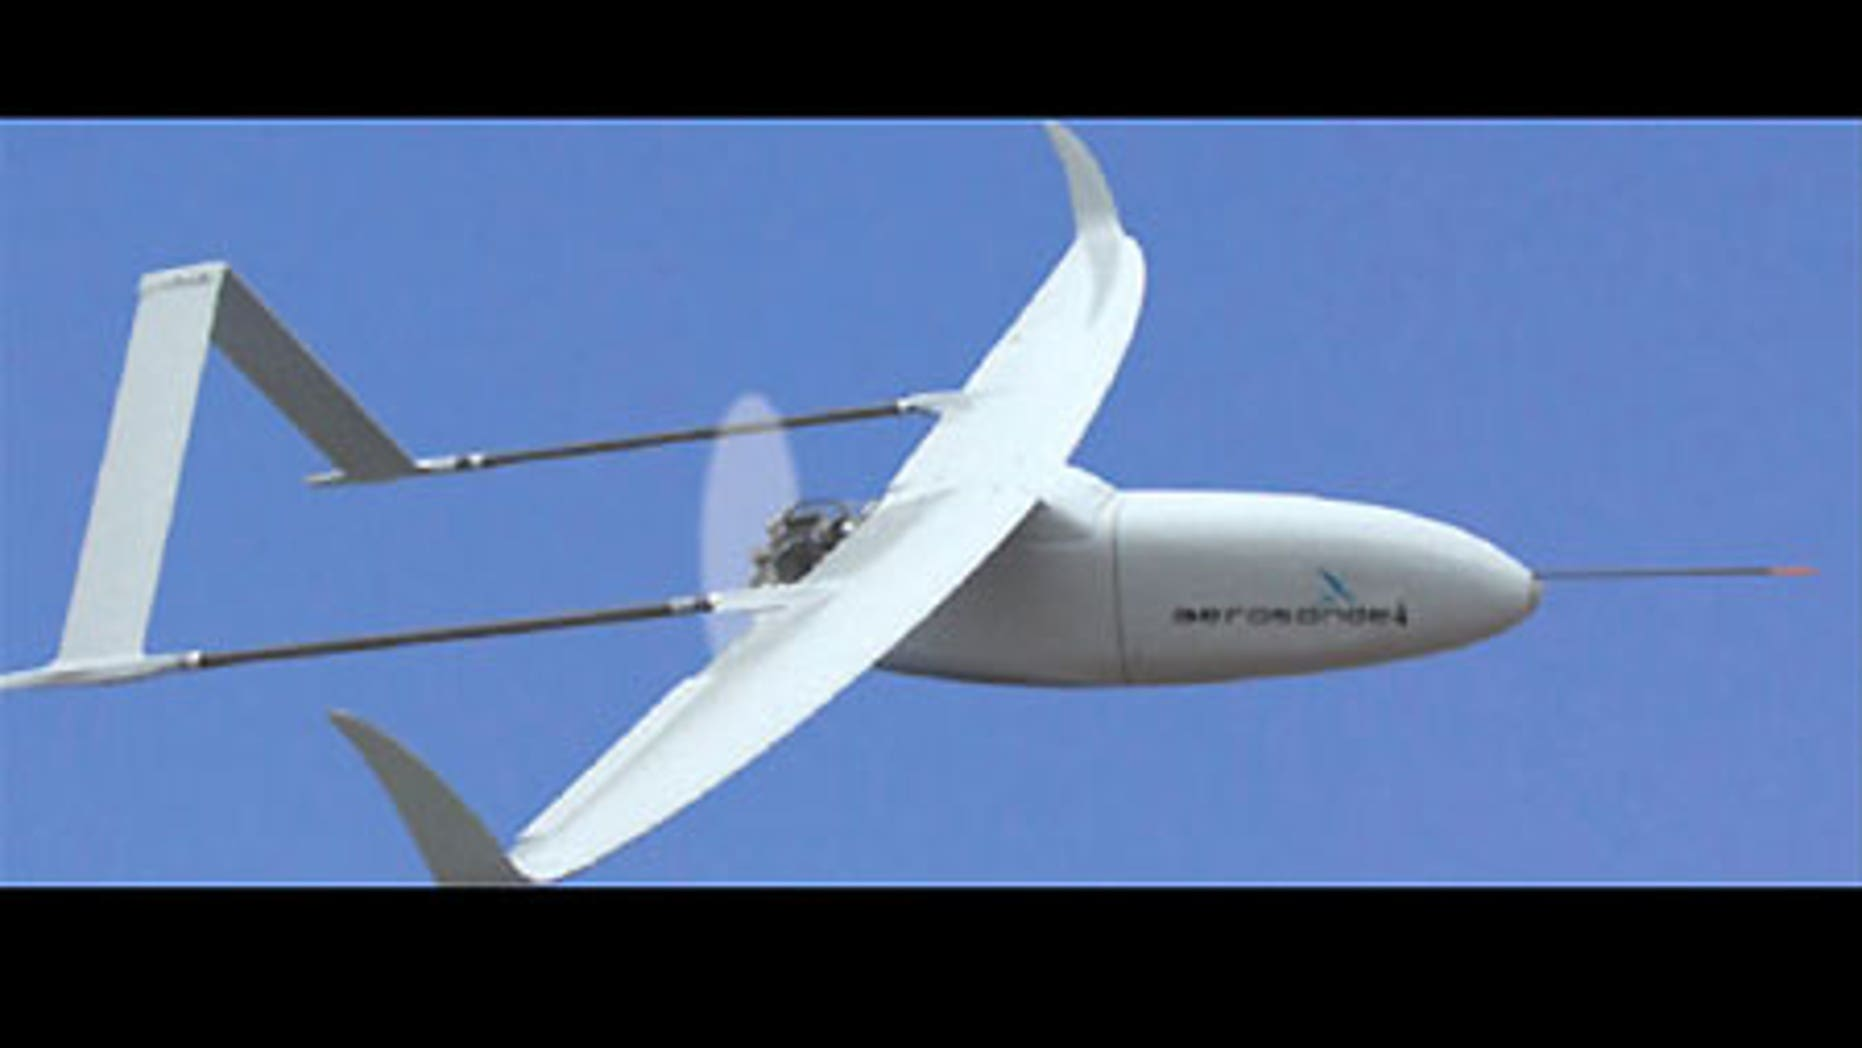 Kansas State's Aerosonde unmanned aerial vehicle.